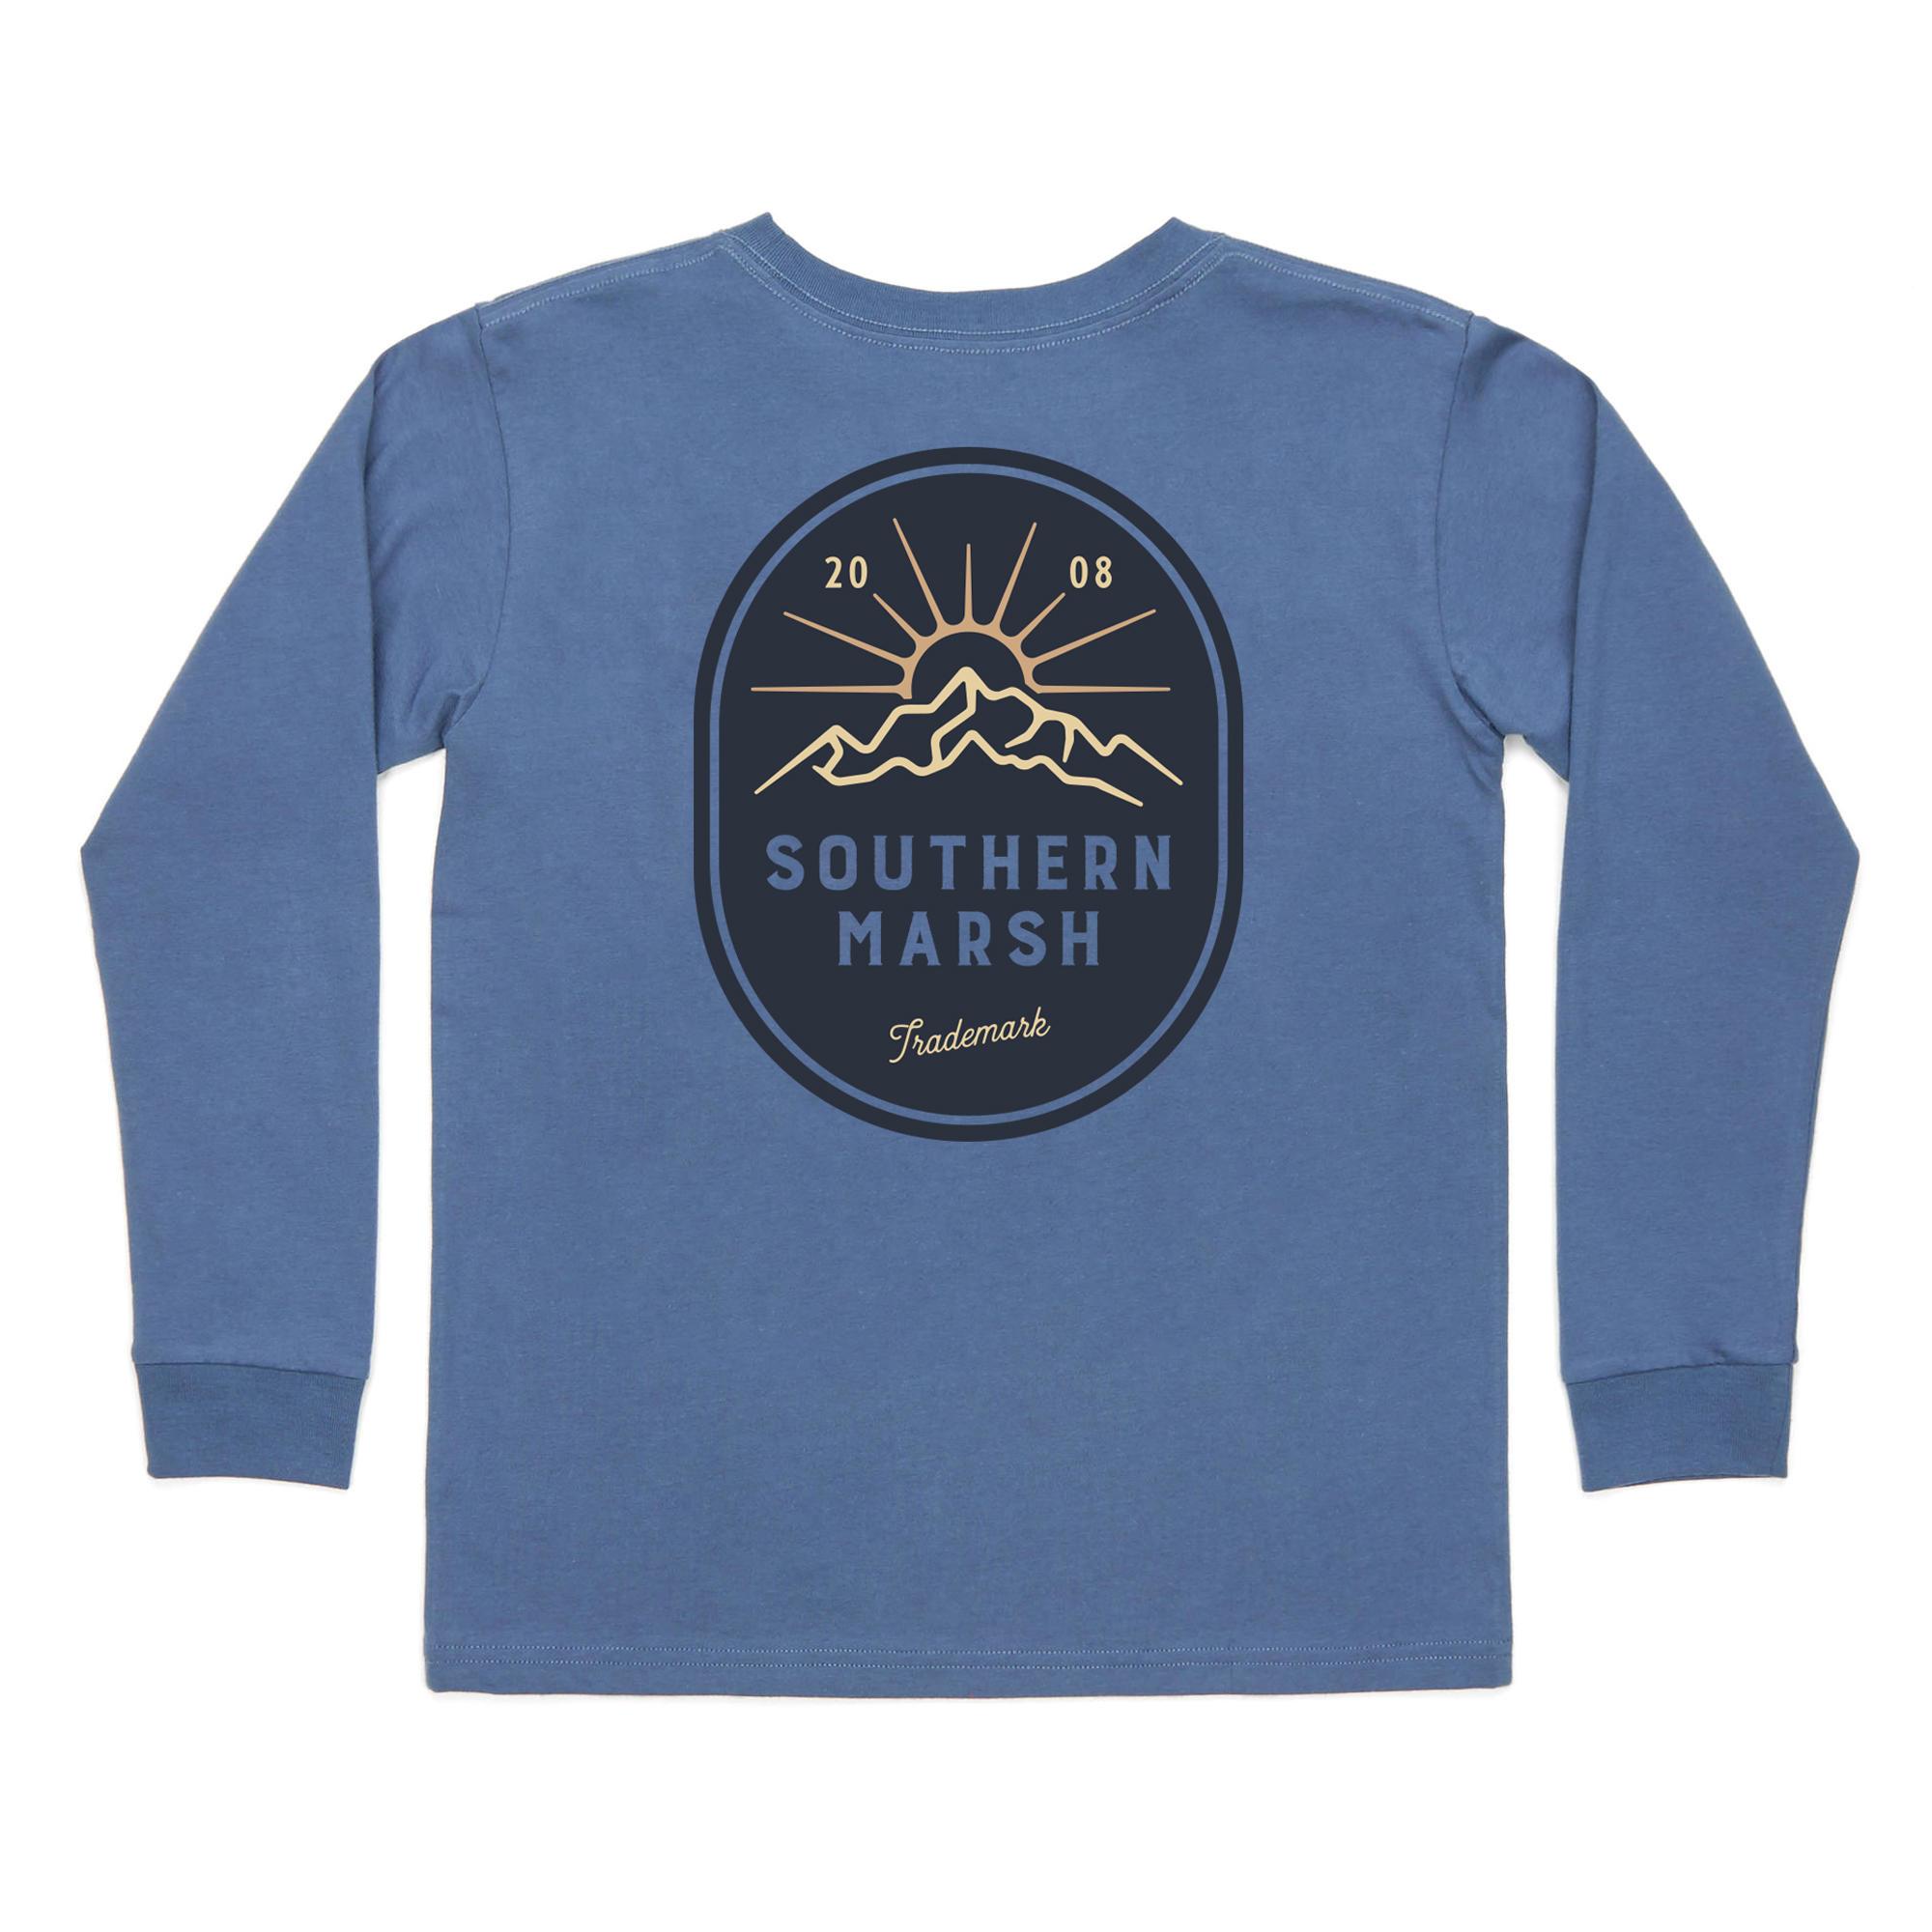 Southern Marsh Youth Branding Mountain Rise Tee - Long Sleeve